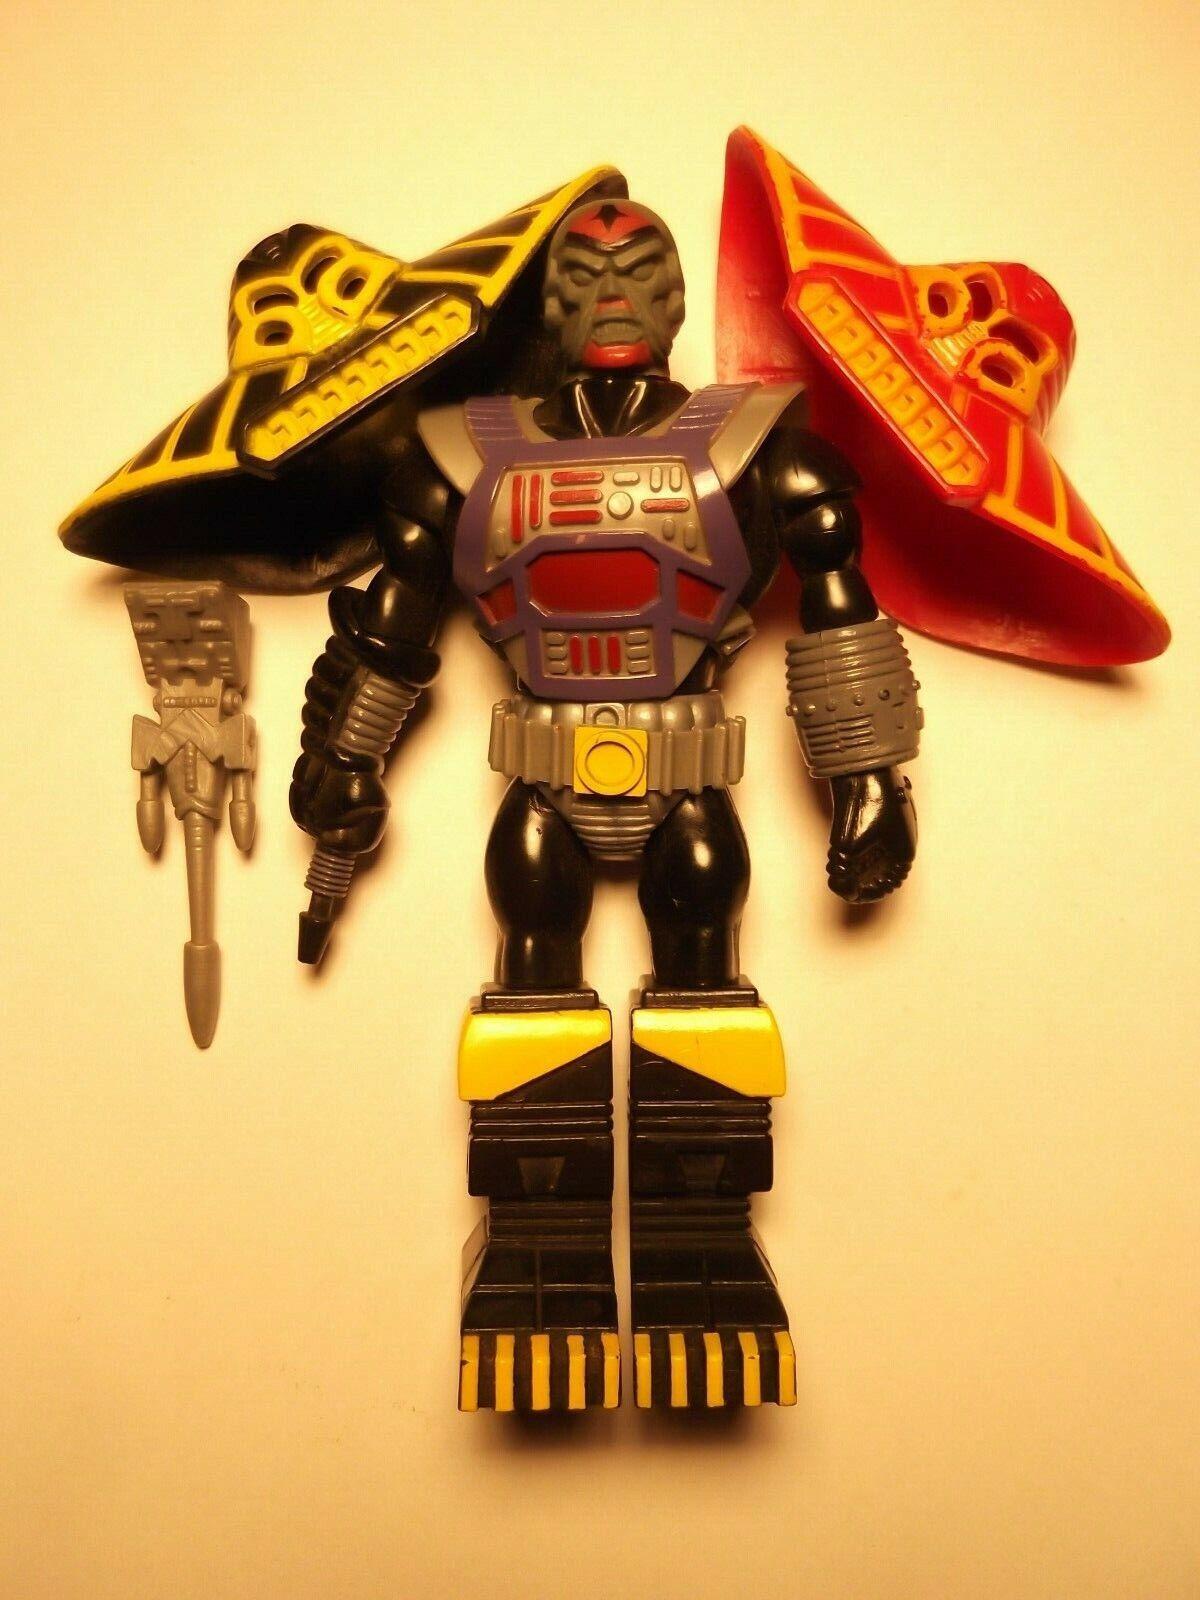 Acamas X-Changers Dark figure complete galaxy warriors motu remco ko sungold 80s